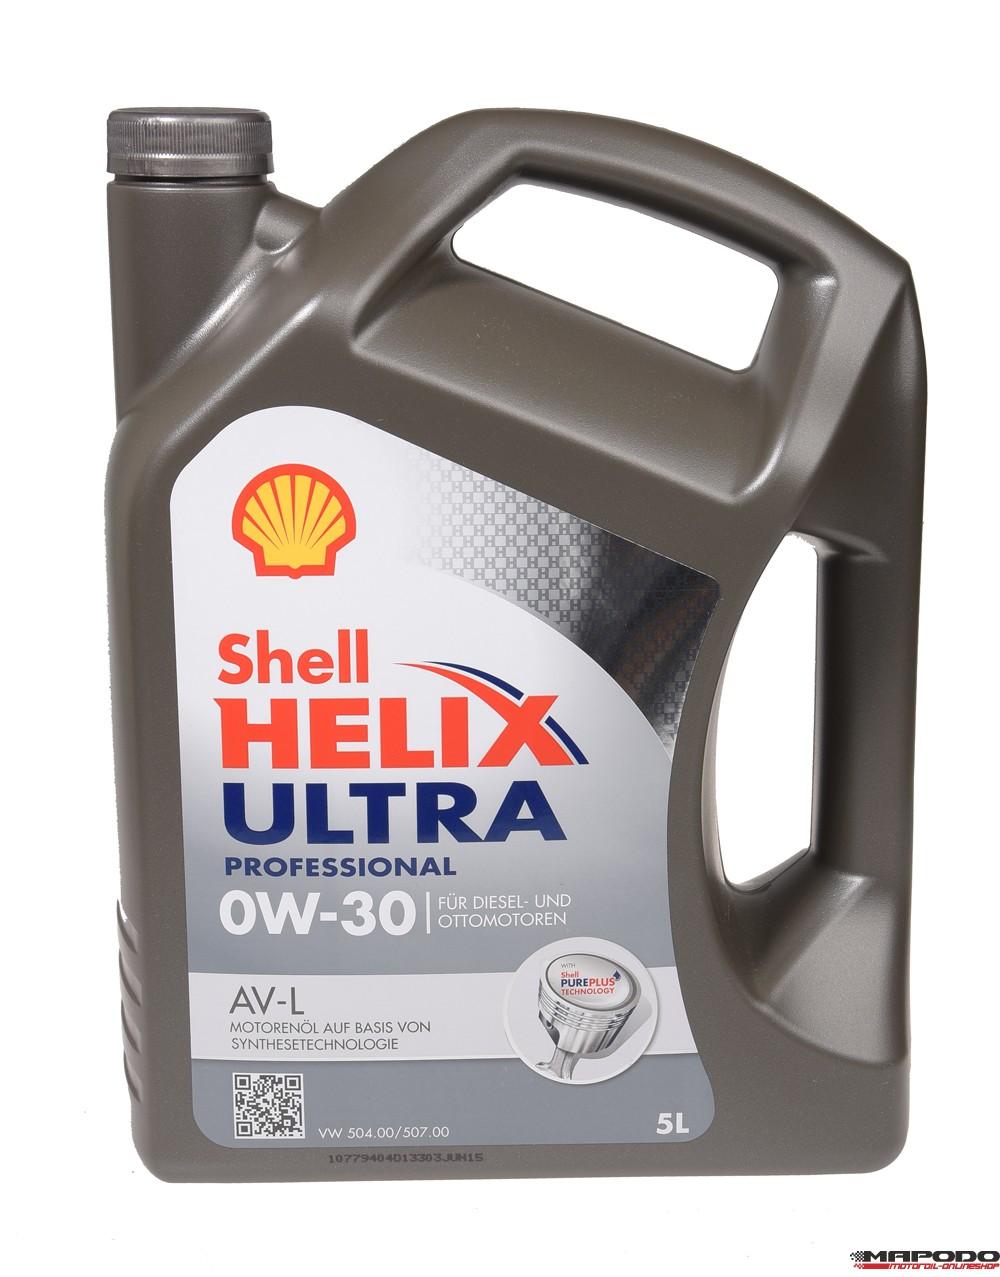 Shell Helix Ultra Professional 0W-30 AV-L 5L (VW 504.00/507.00)